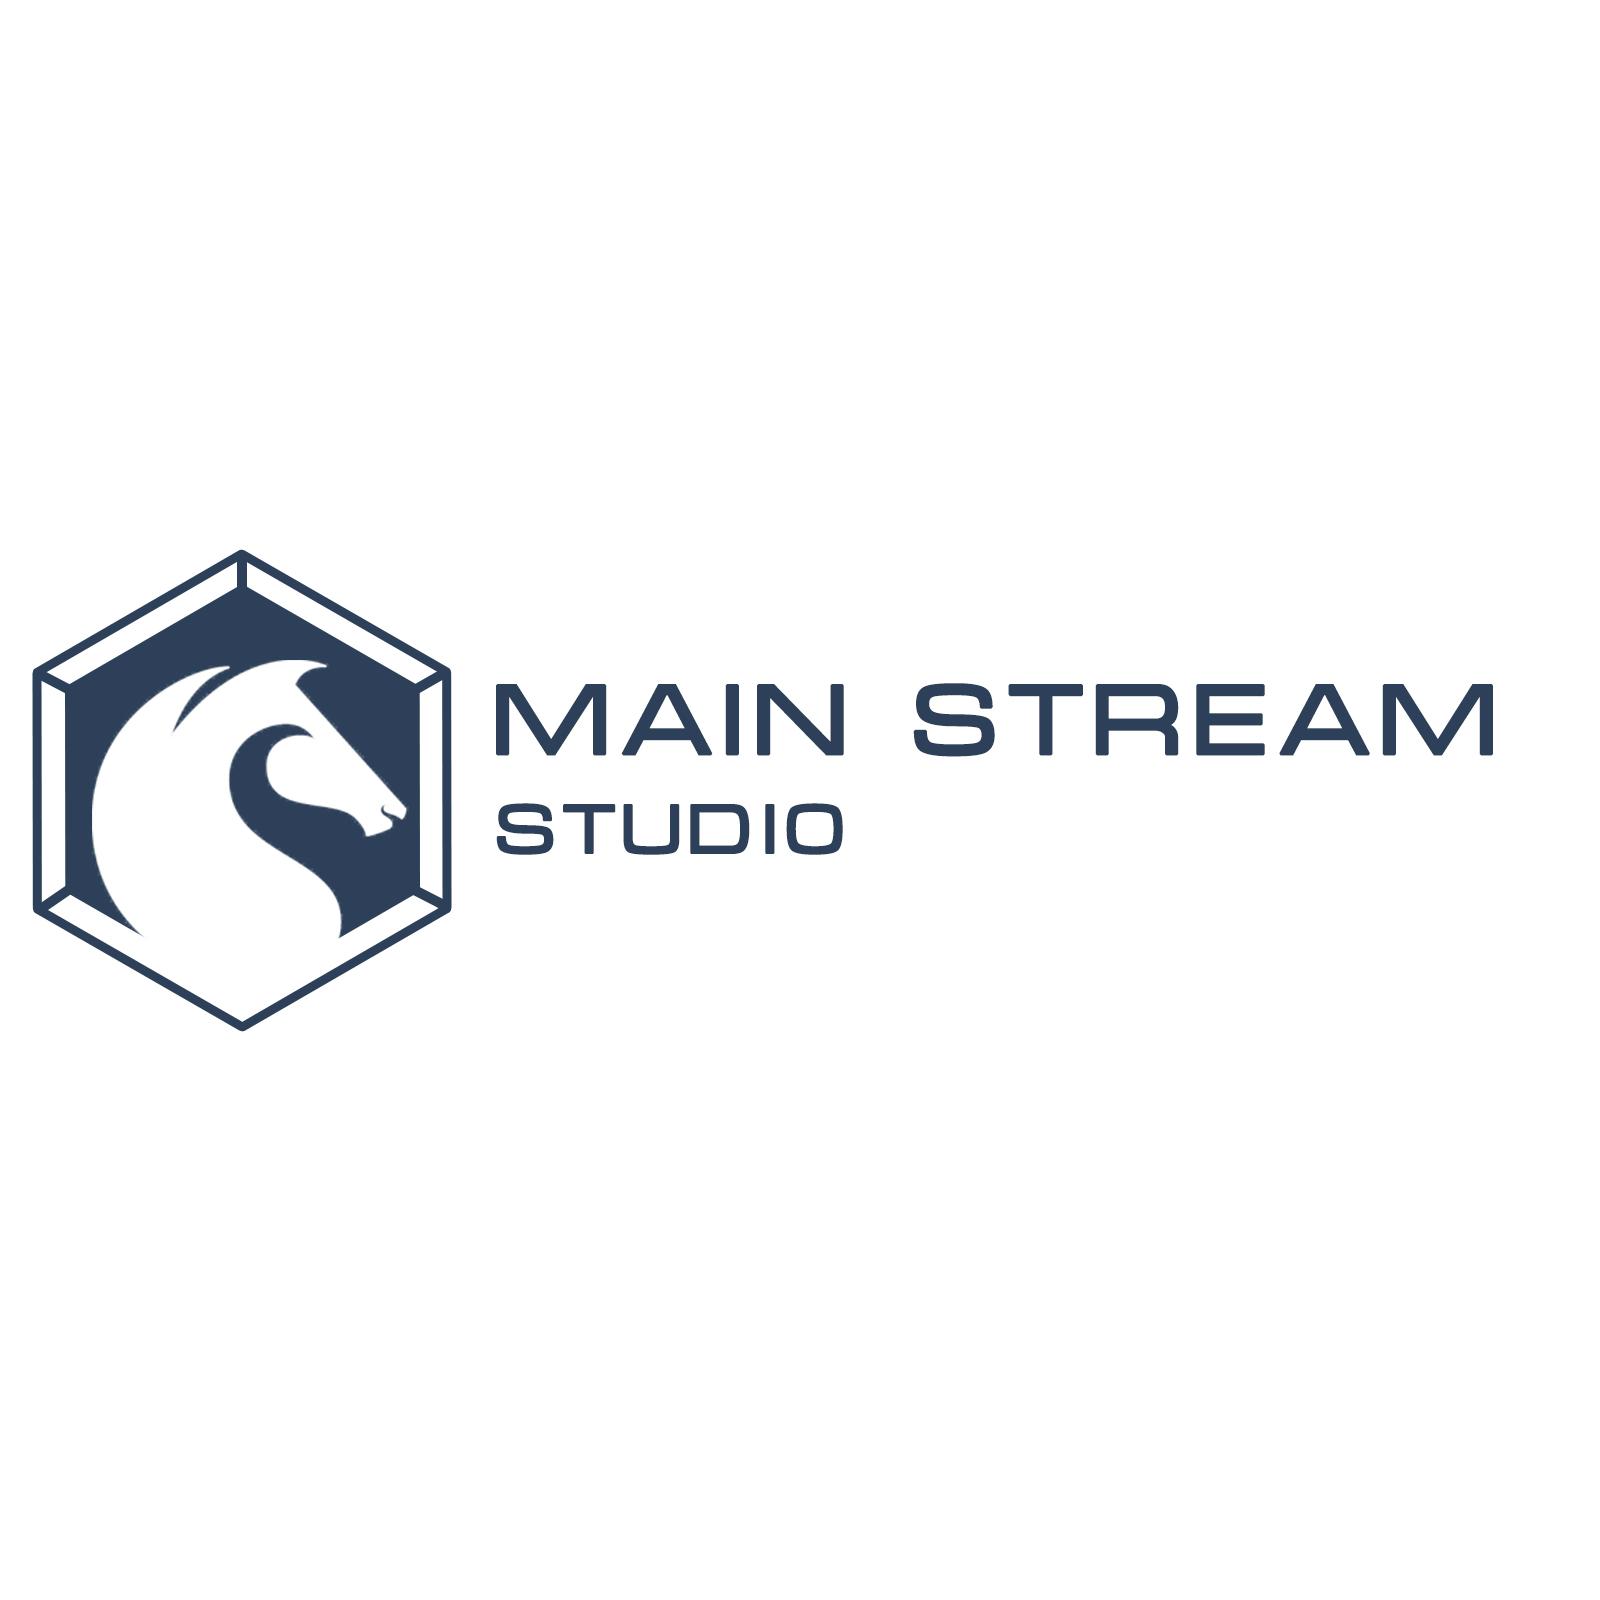 Main Stream Studio